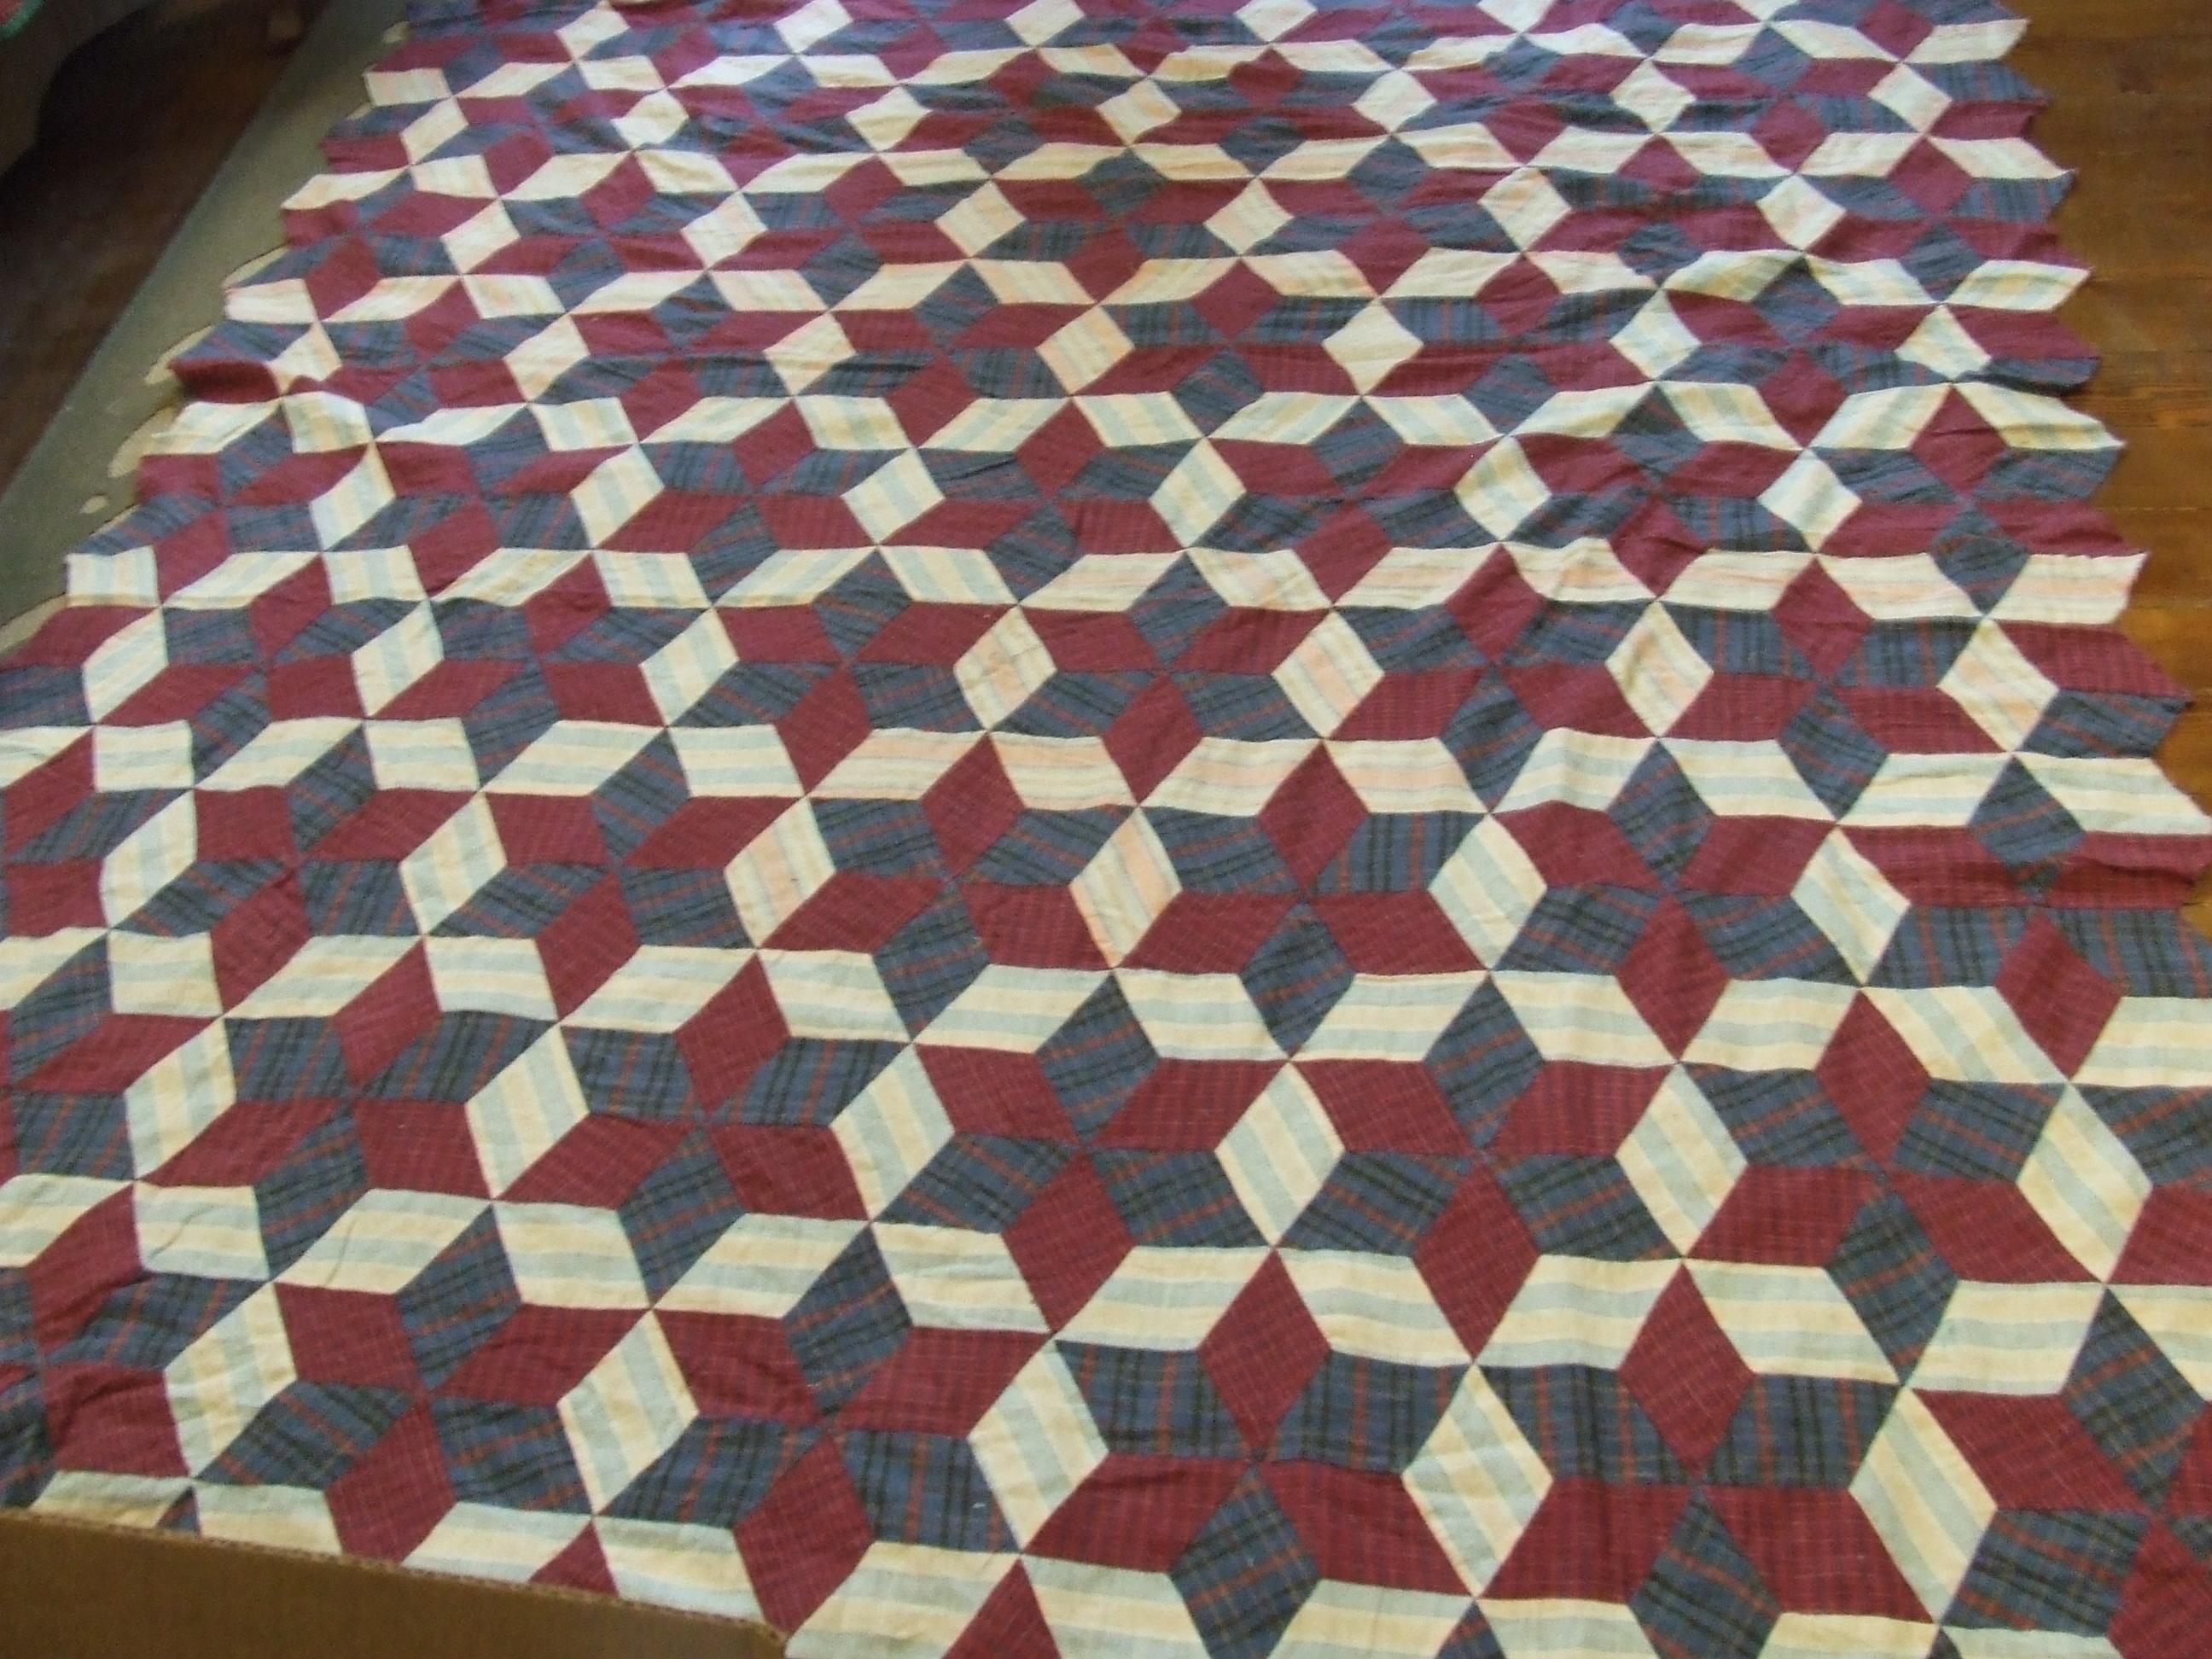 Quilt Patterns For Flannel : flannel quilt Tim Latimer - Quilts etc